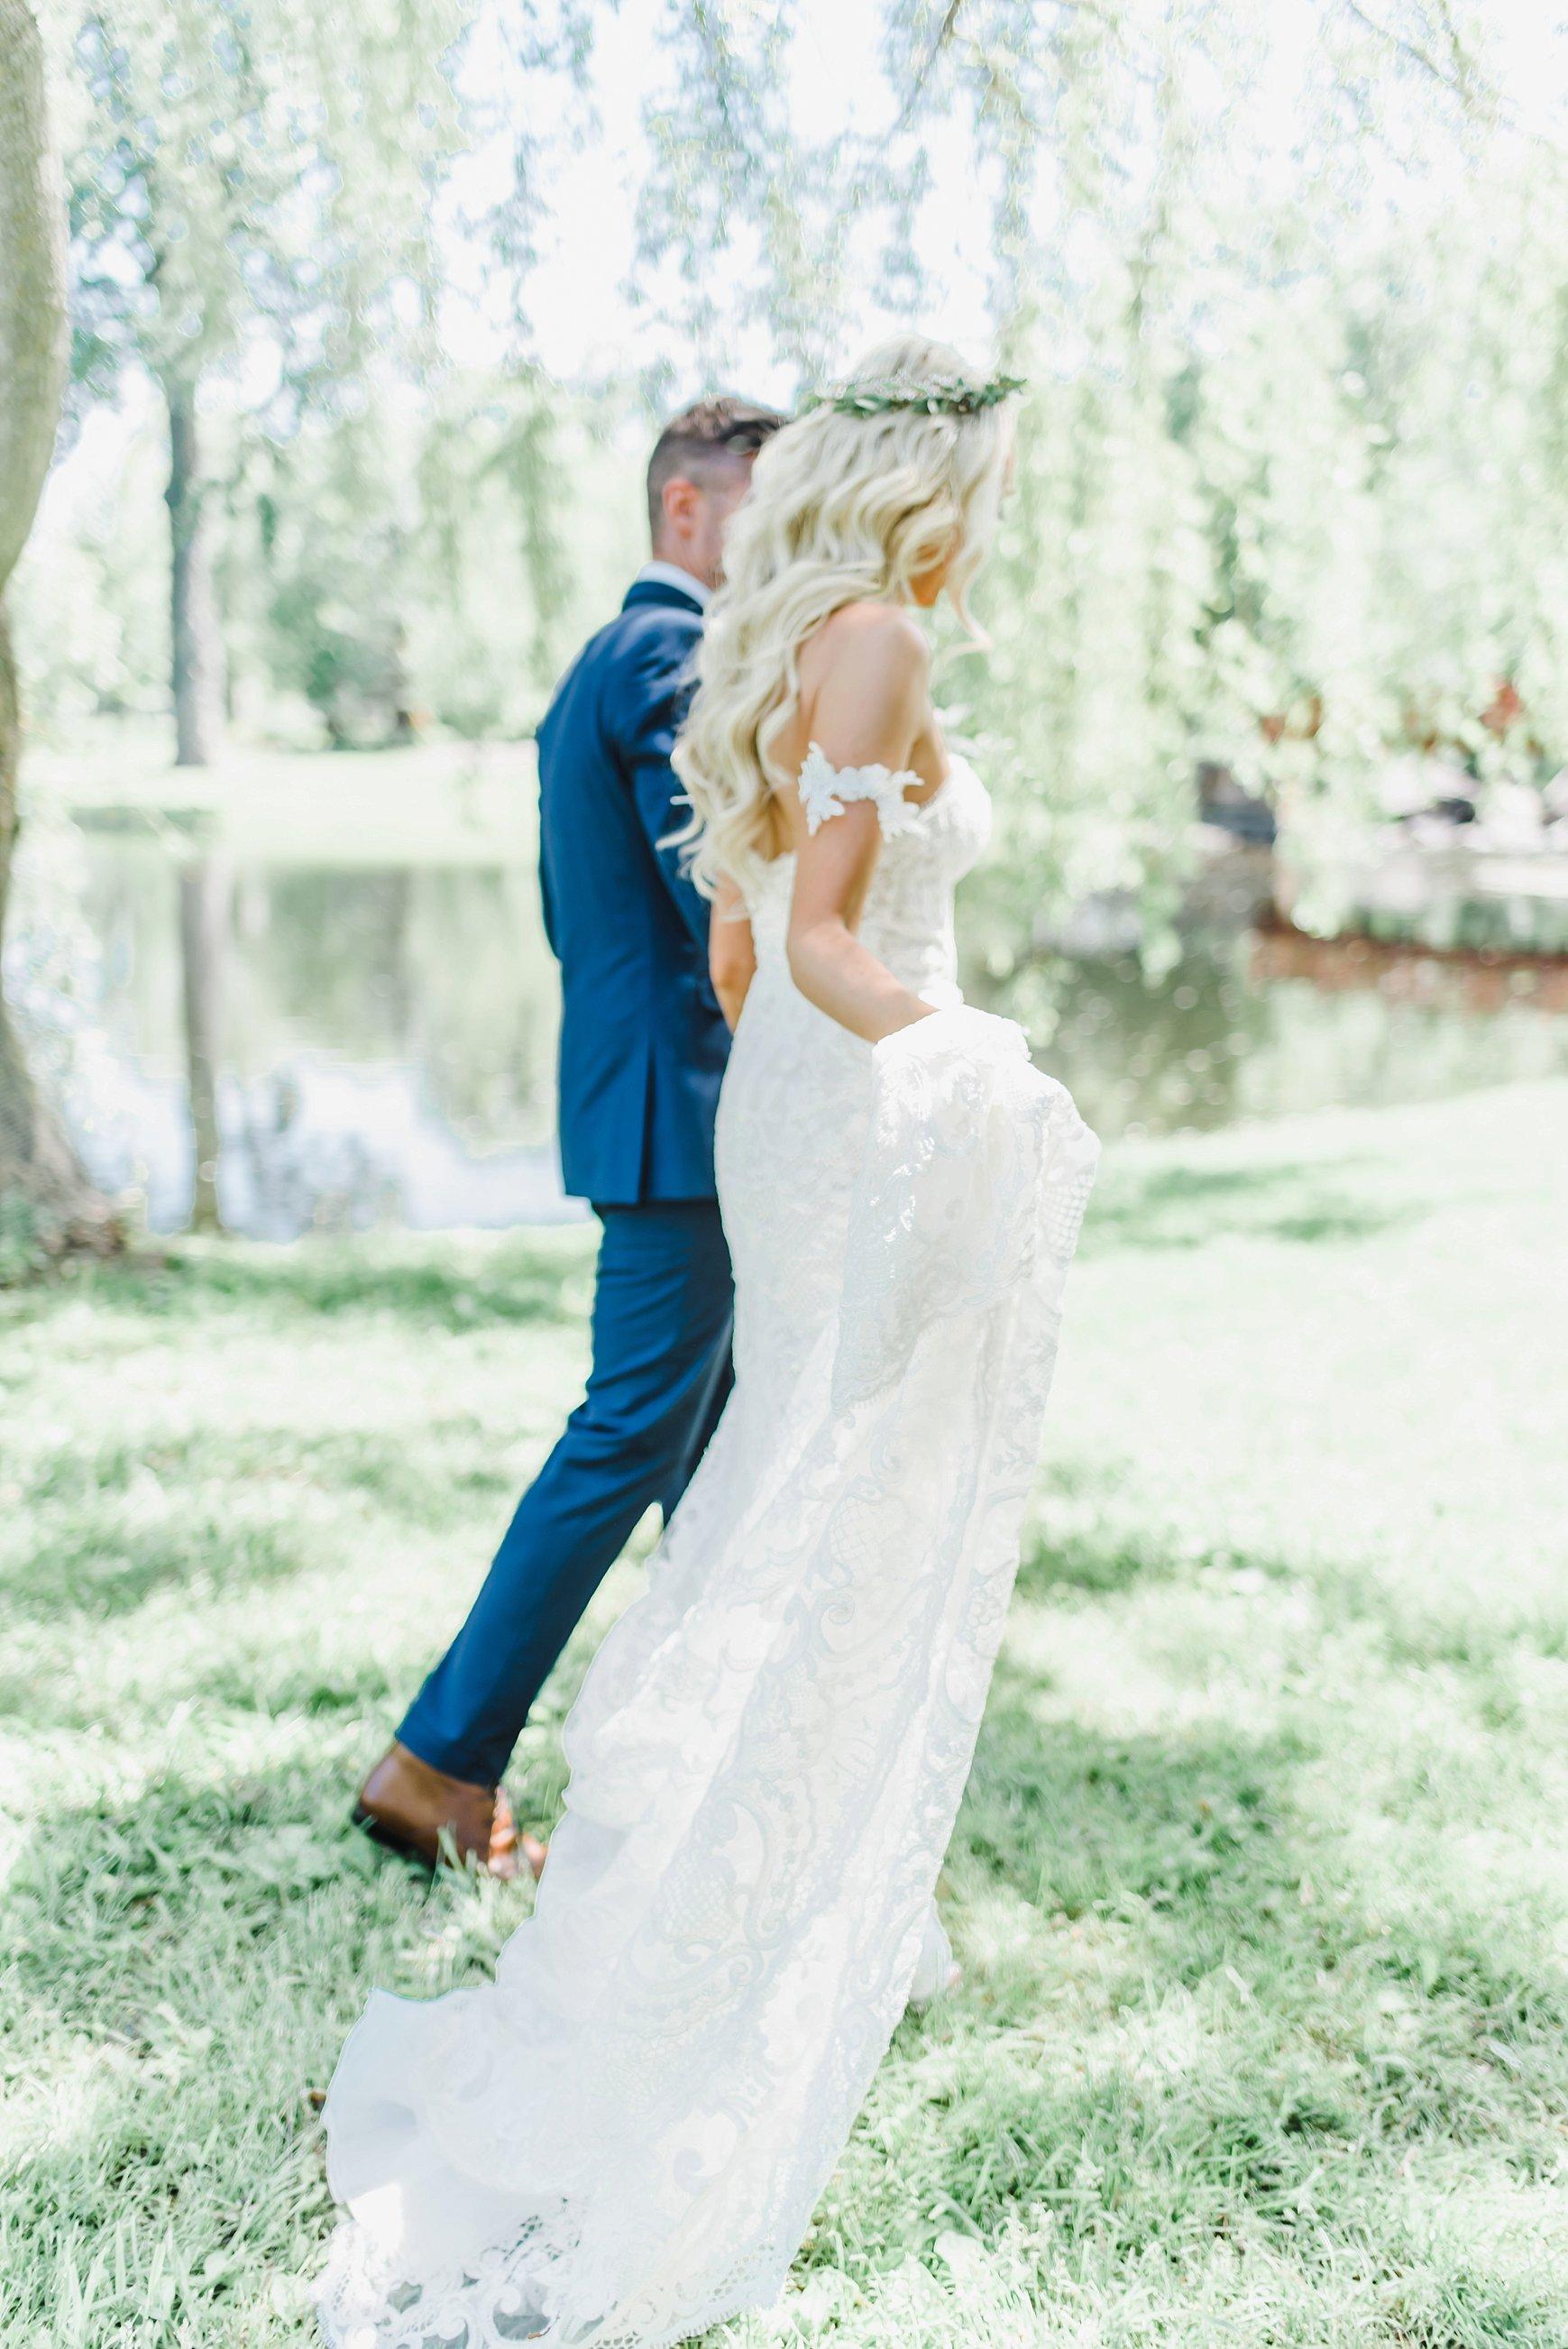 light airy indie fine art ottawa wedding photographer | Ali and Batoul Photography_0039.jpg